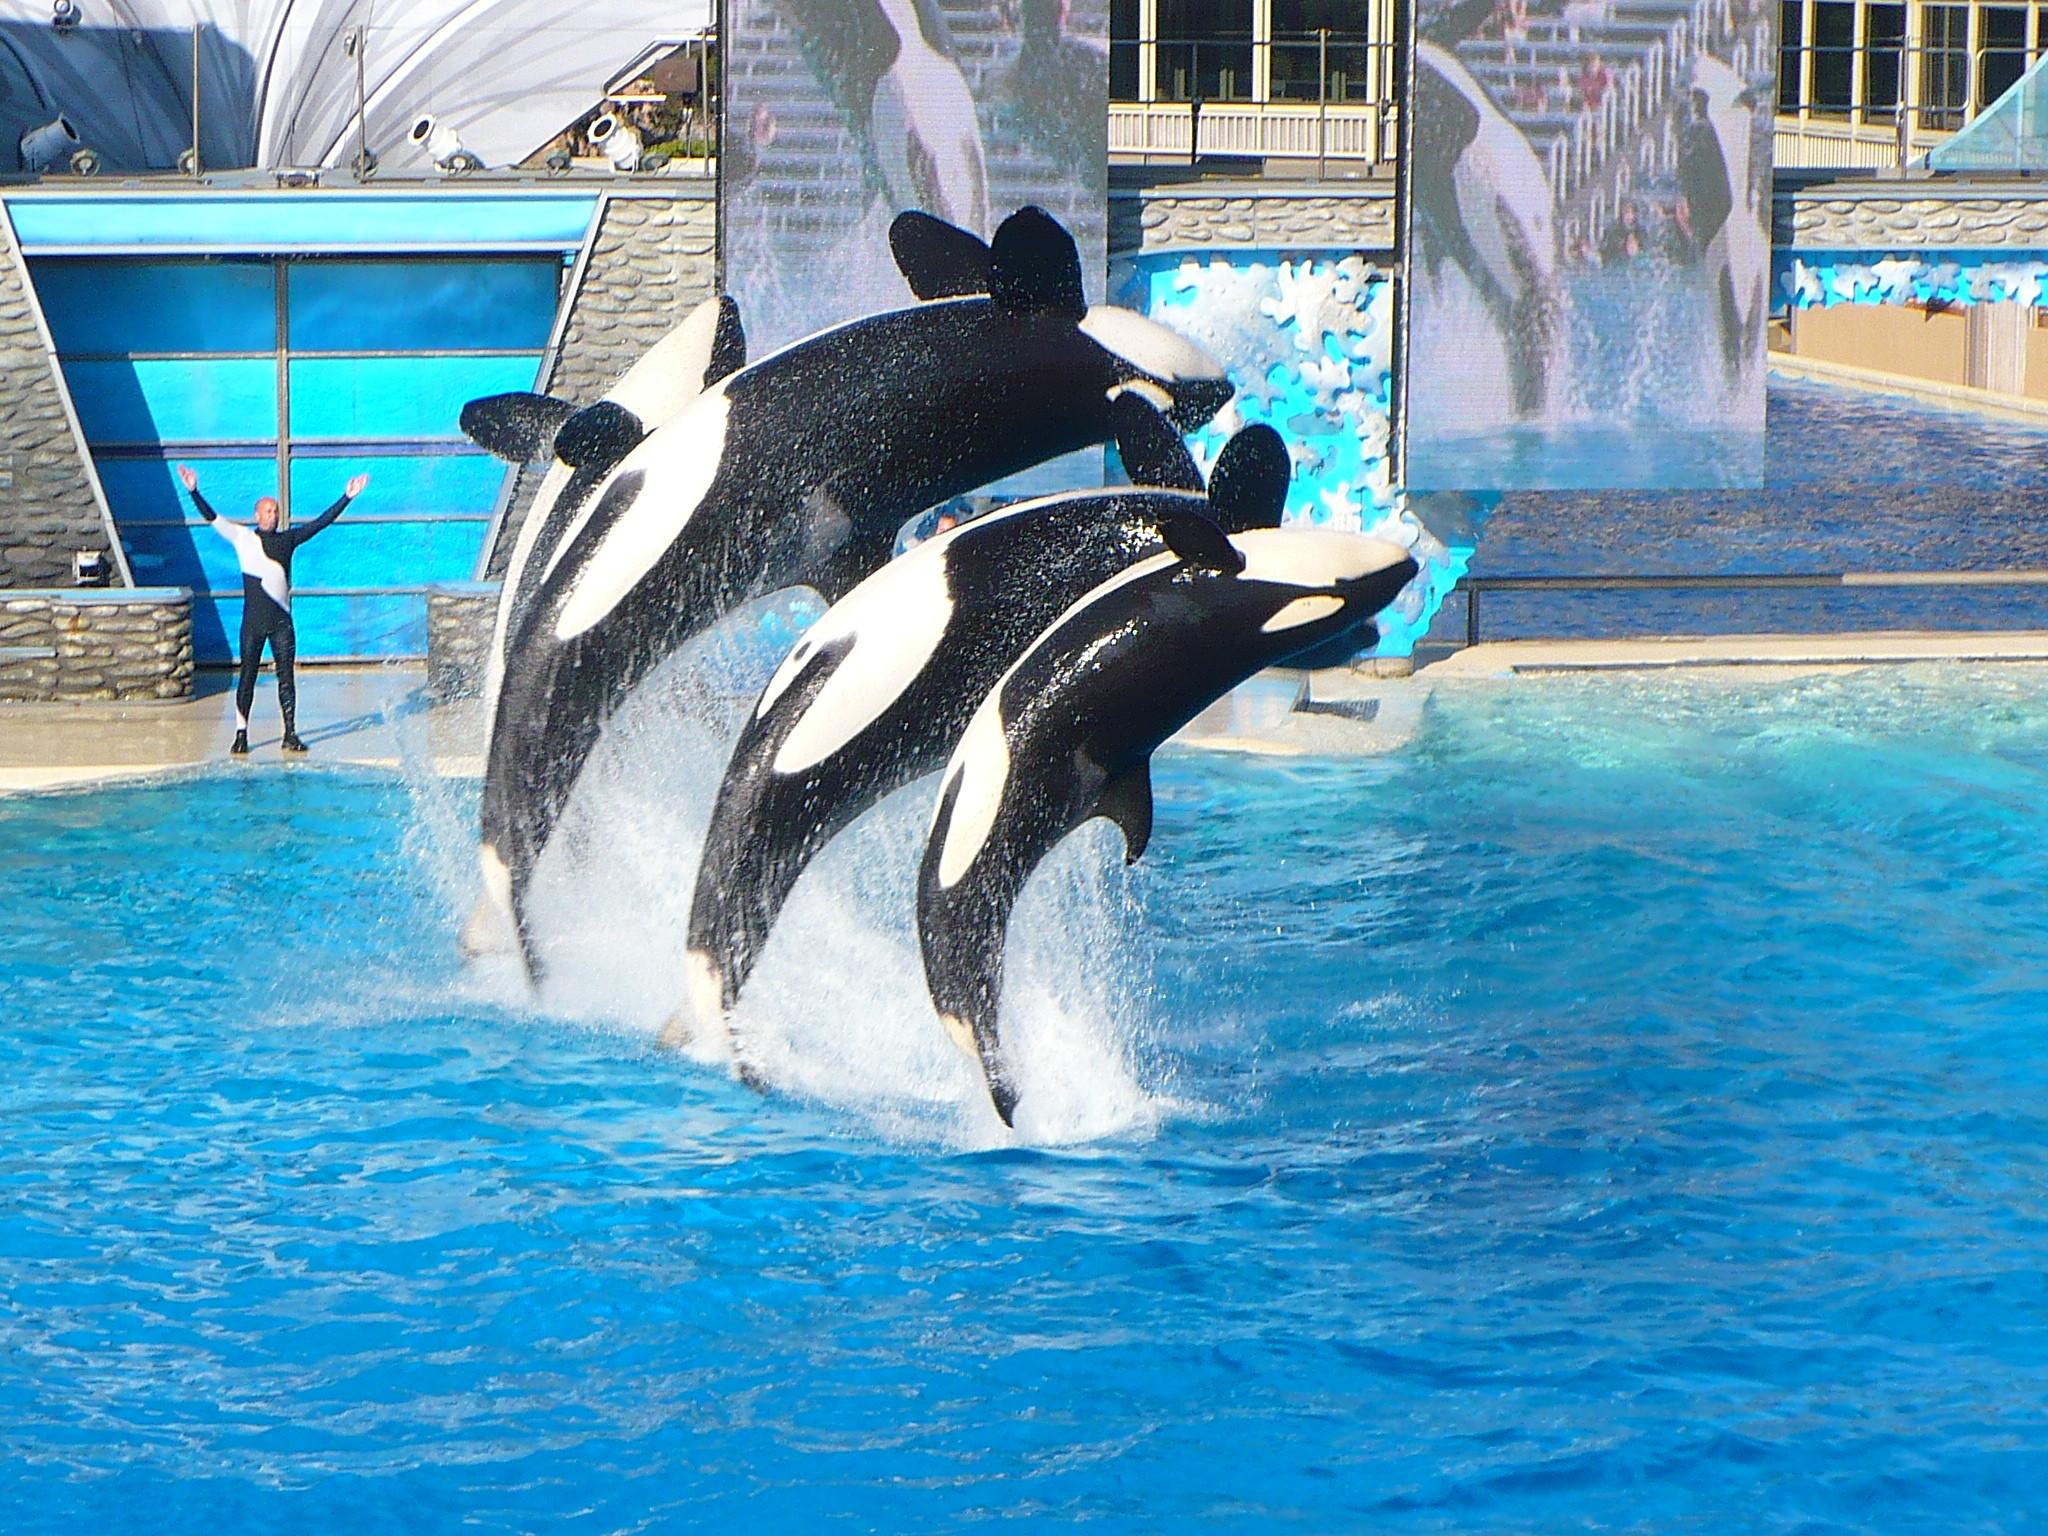 Res: 2048x1536, Shamu Show at Sea World in San Diego, CA.